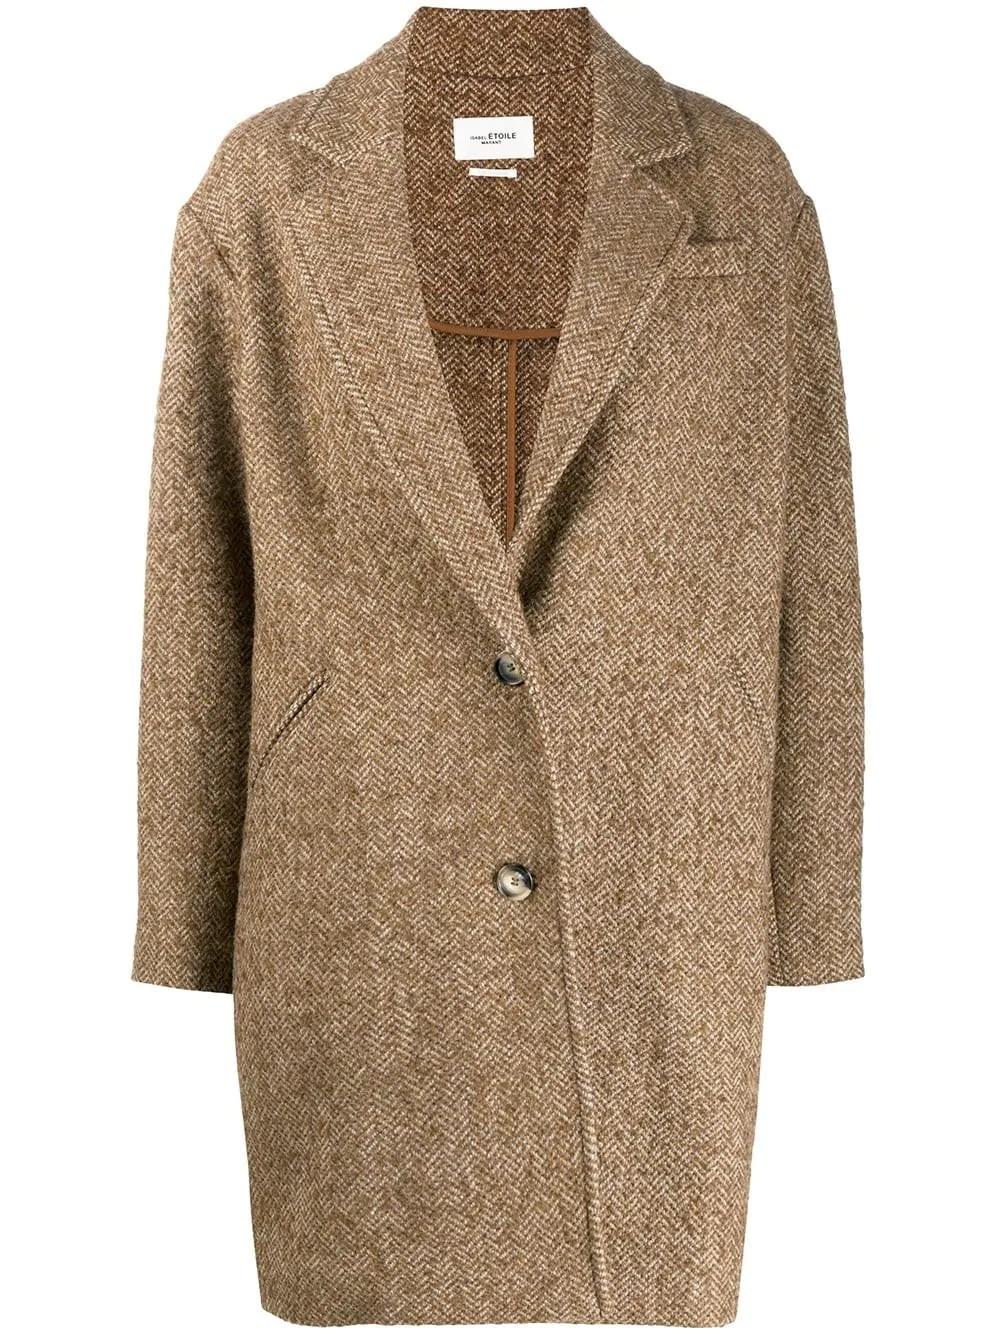 "ISABEL MARANT ETOILE Camel Beige Wool ""Dante"" Coat"